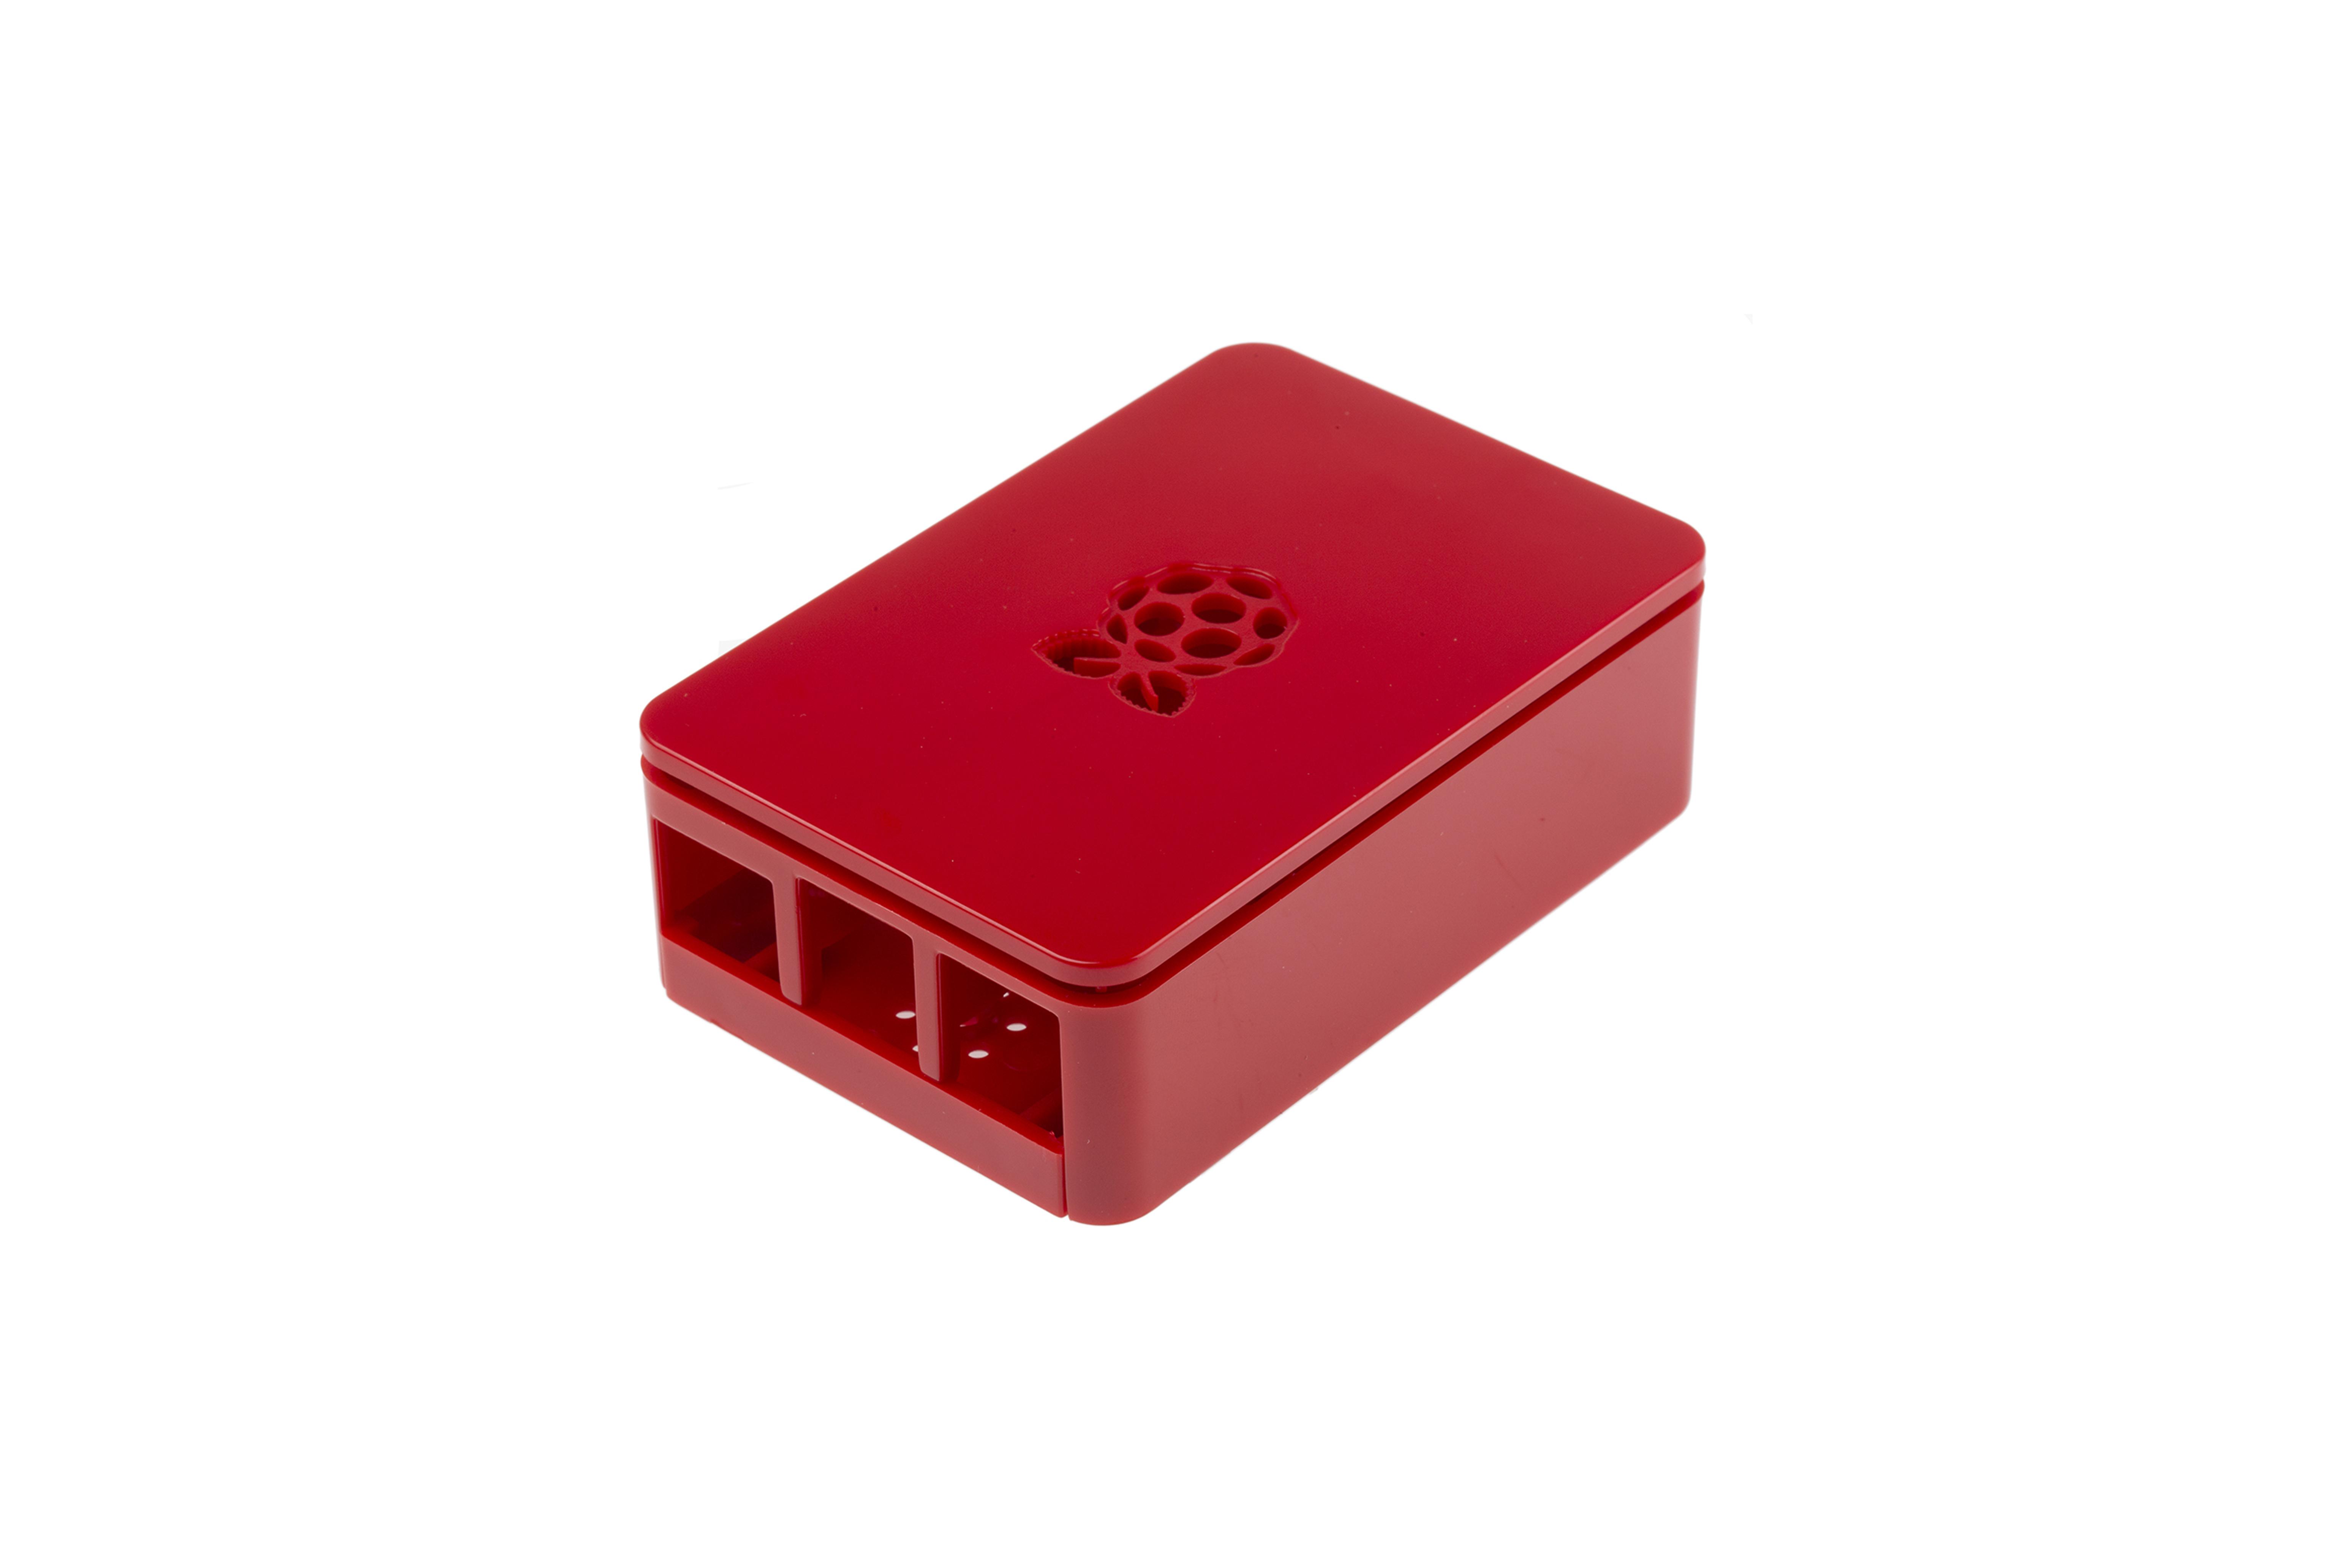 Raspberry Pi(ラズベリーパイ)3エンクロージャー、レッド